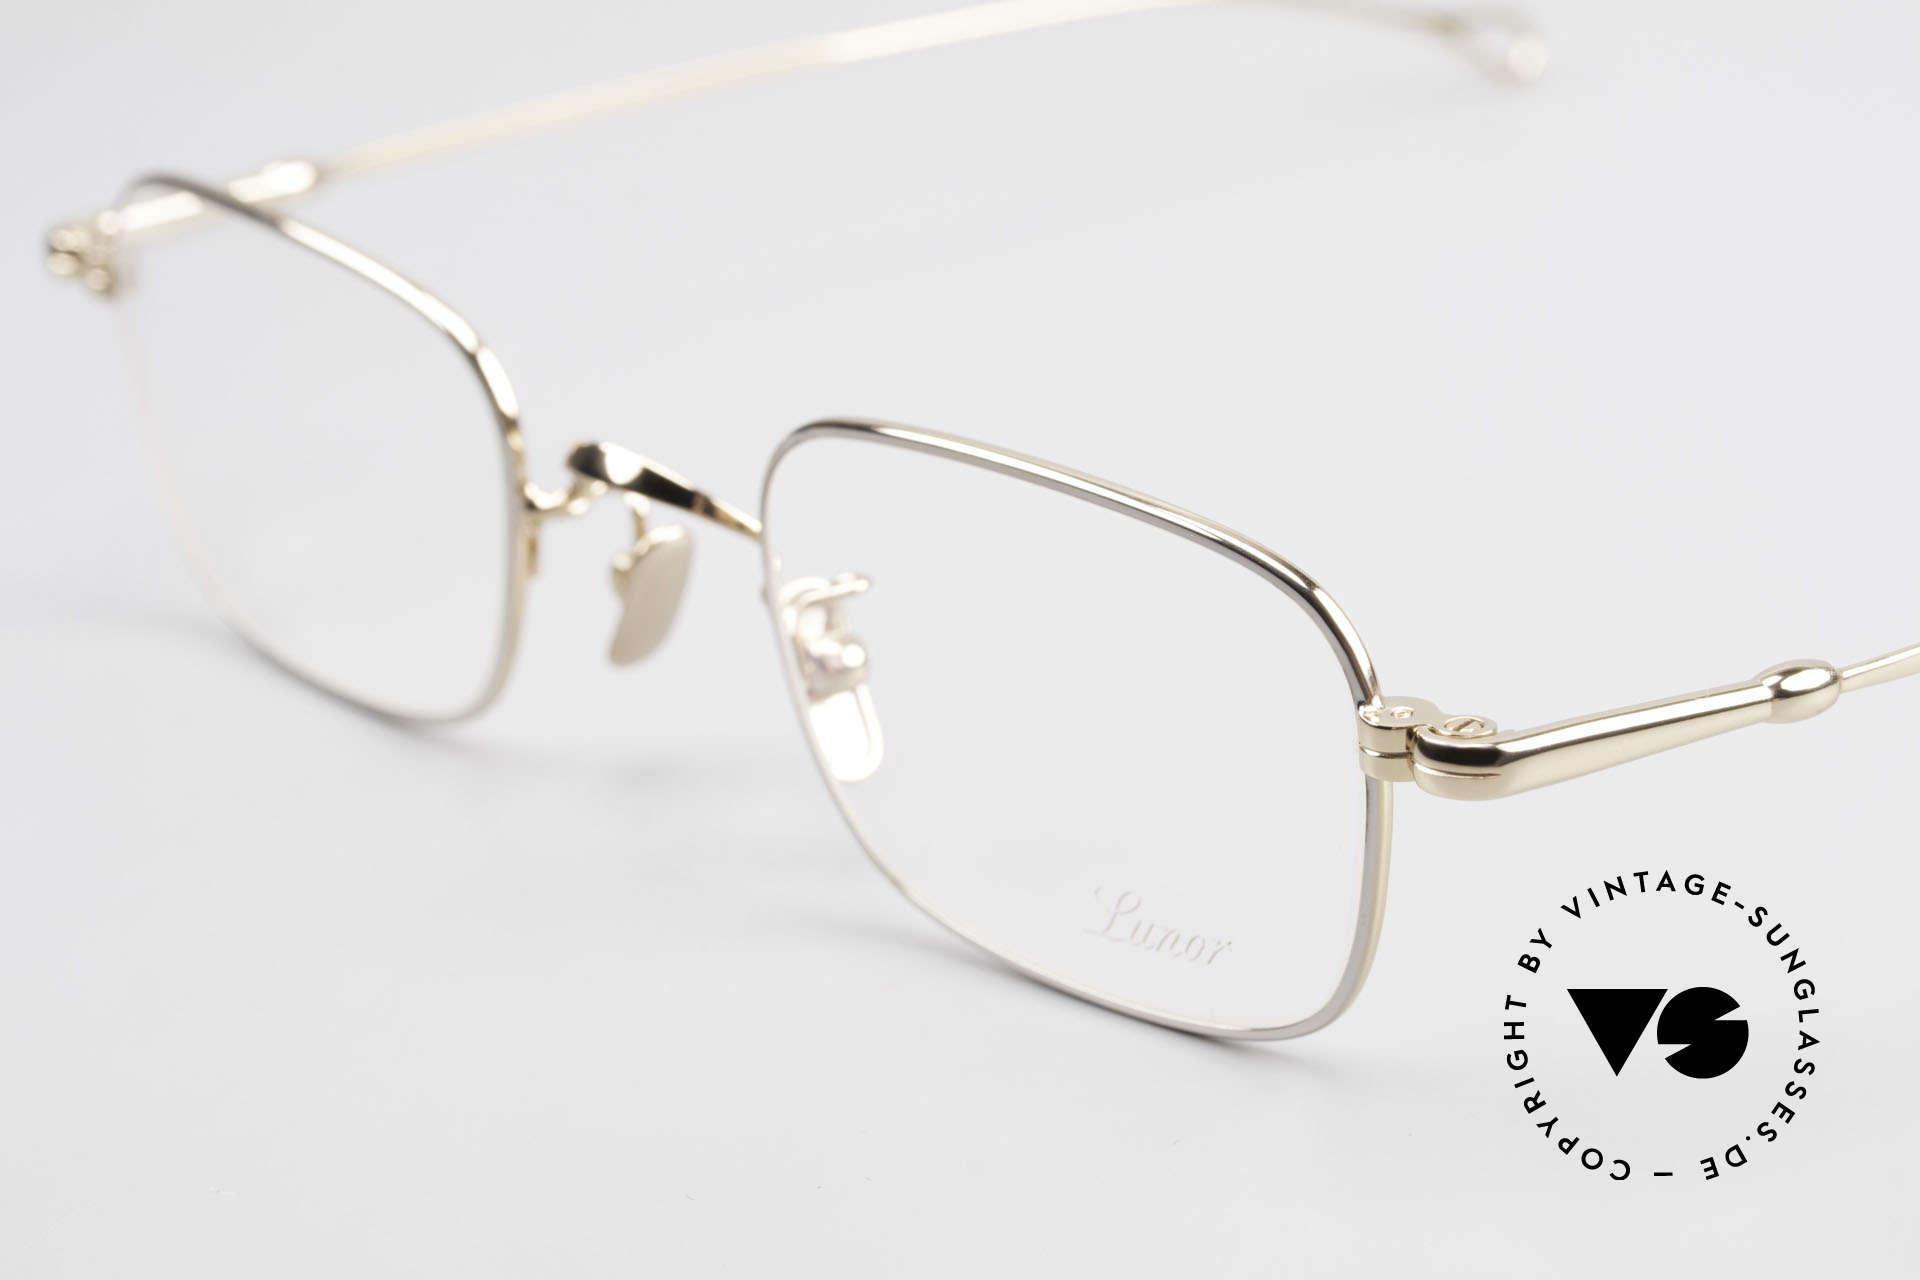 Lunor V 109 Old Lunor Men's Frame Metal, mod. V109: a very elegant eyewear classic for gentlemen, Made for Men